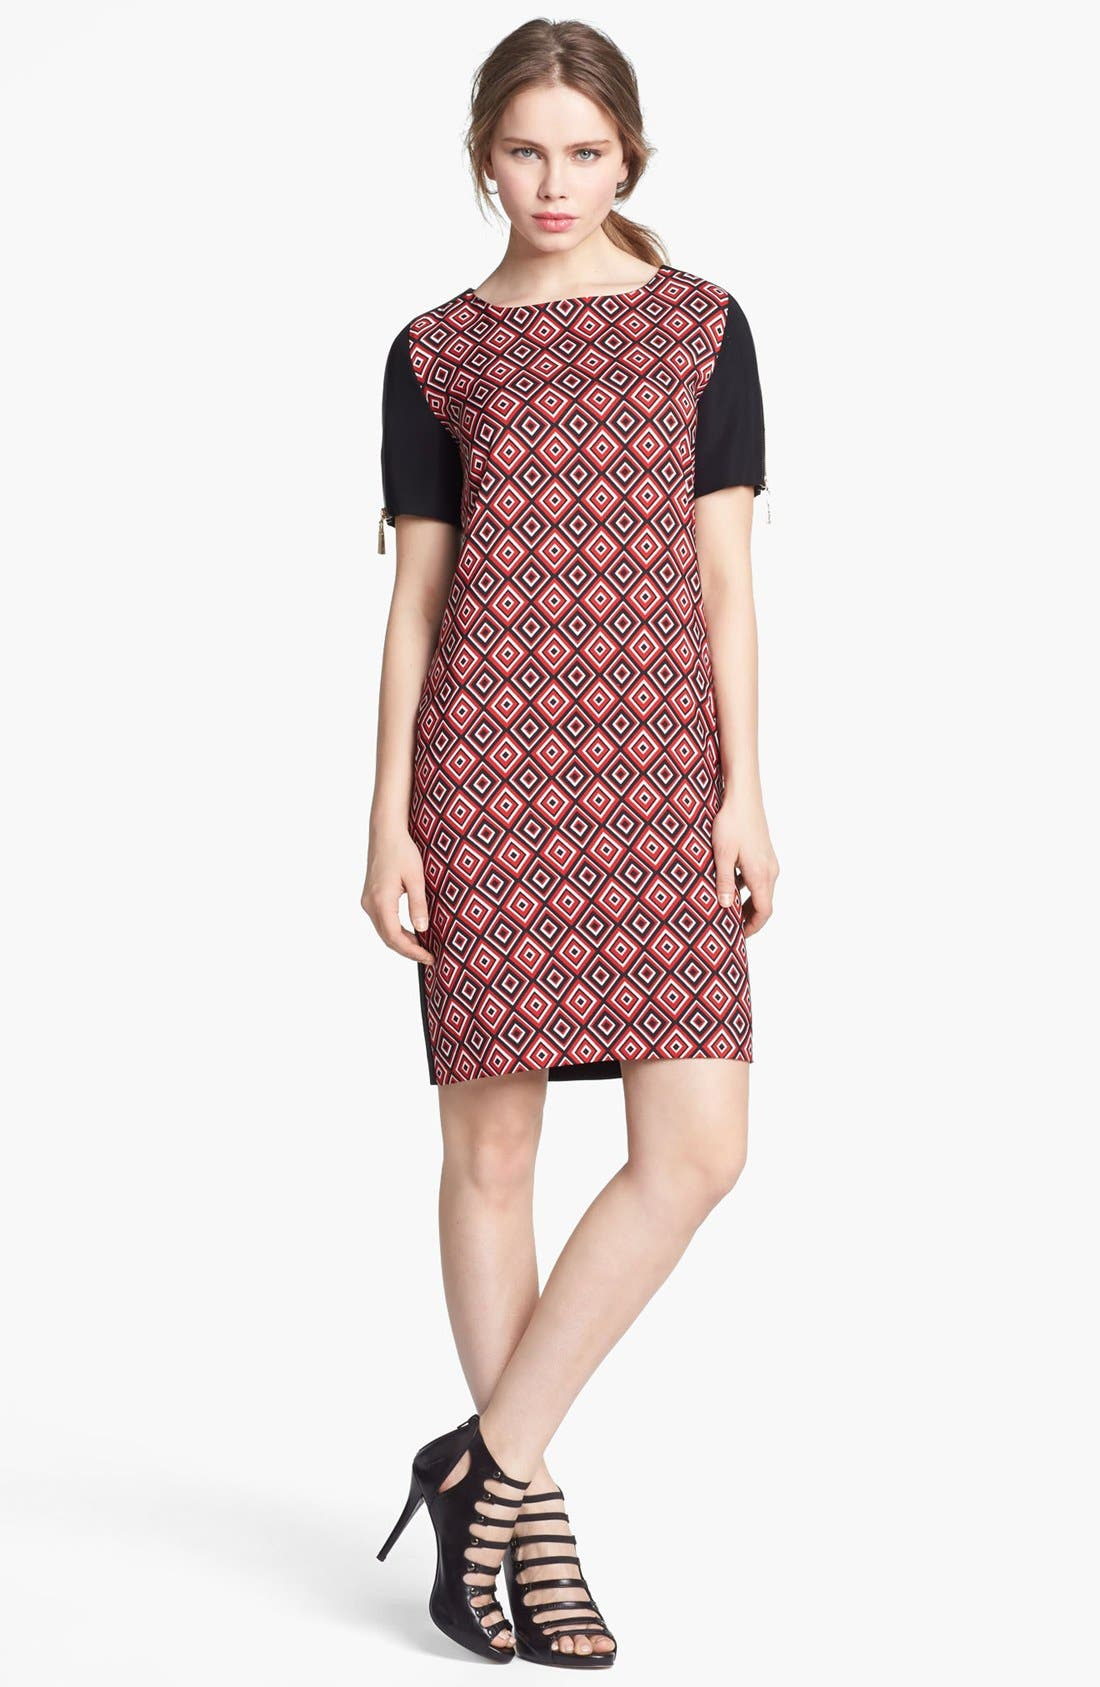 Alternate Image 1 Selected - Vince Camuto Diamond Tile Print Shift Dress